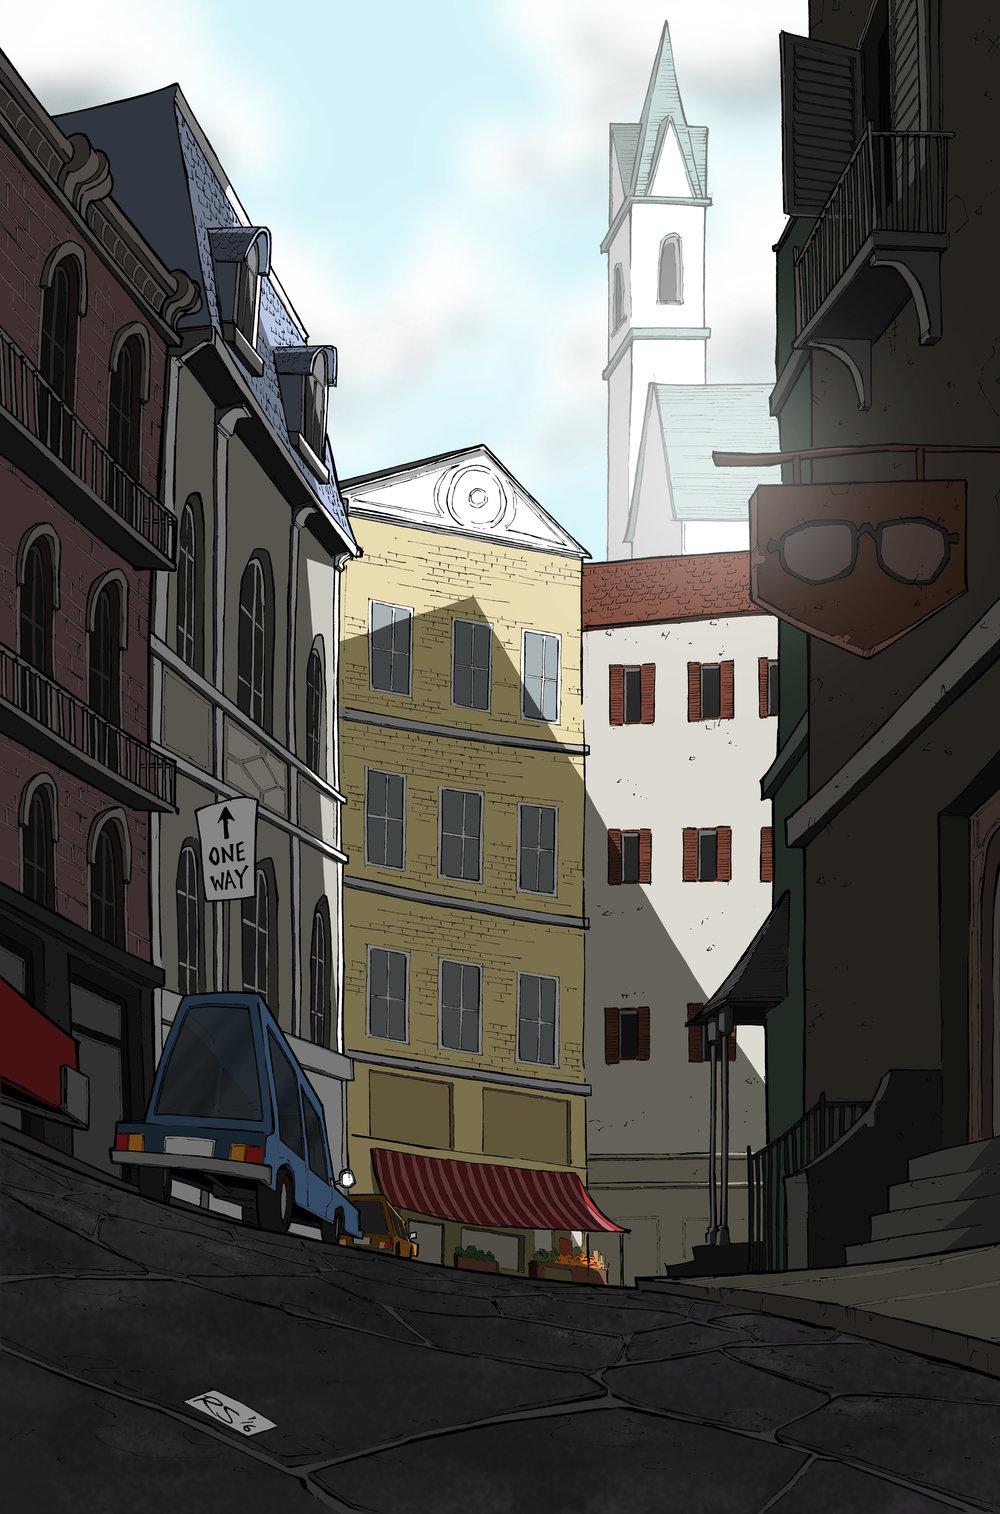 Smallstreet_color.jpg